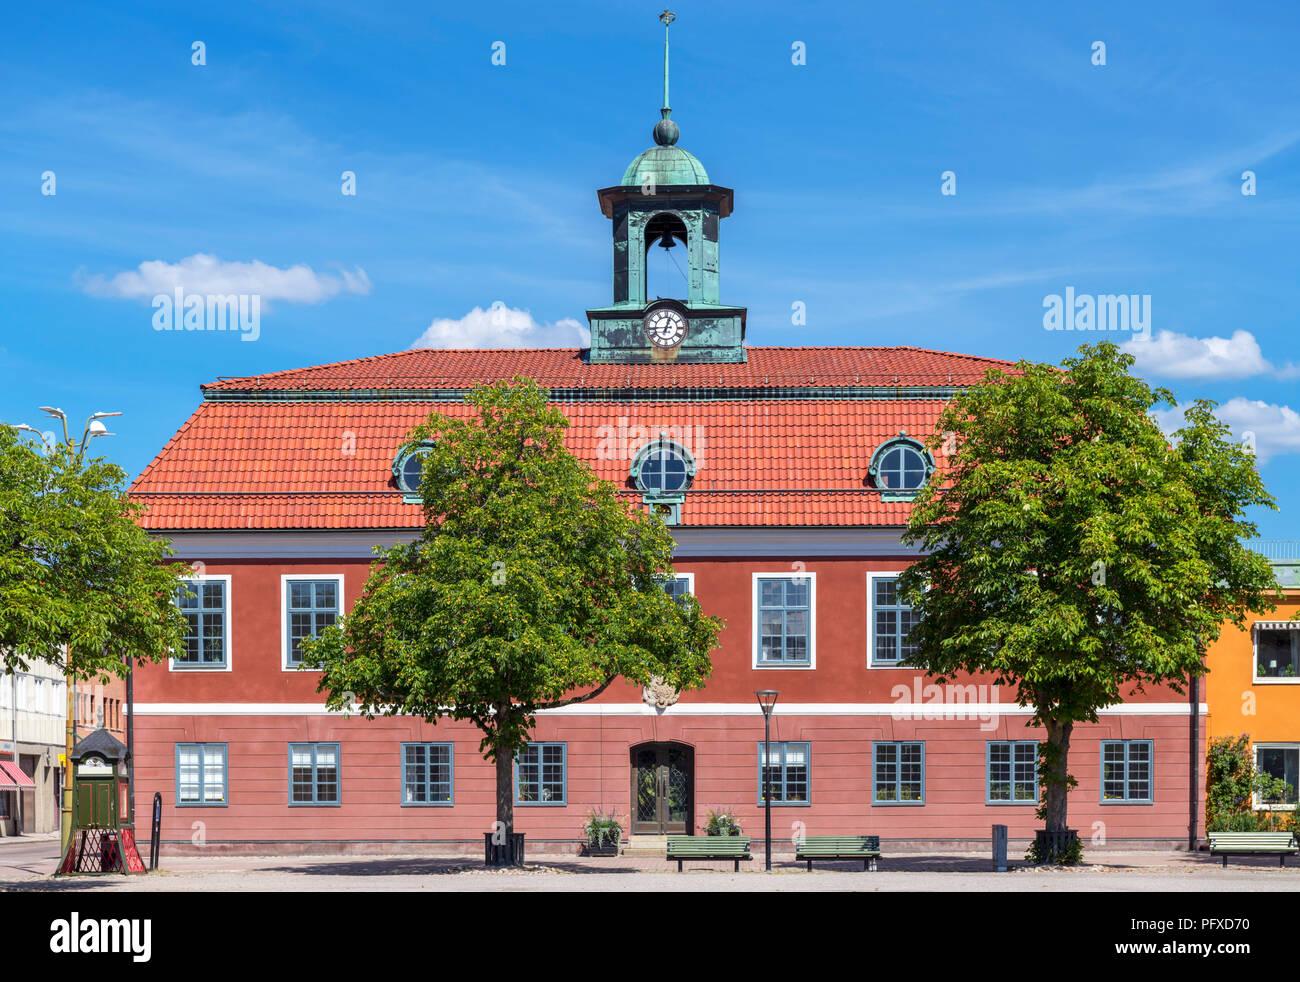 Municipio nella piazza principale (Stora Torget), Sala, Västmanland, Svezia Immagini Stock